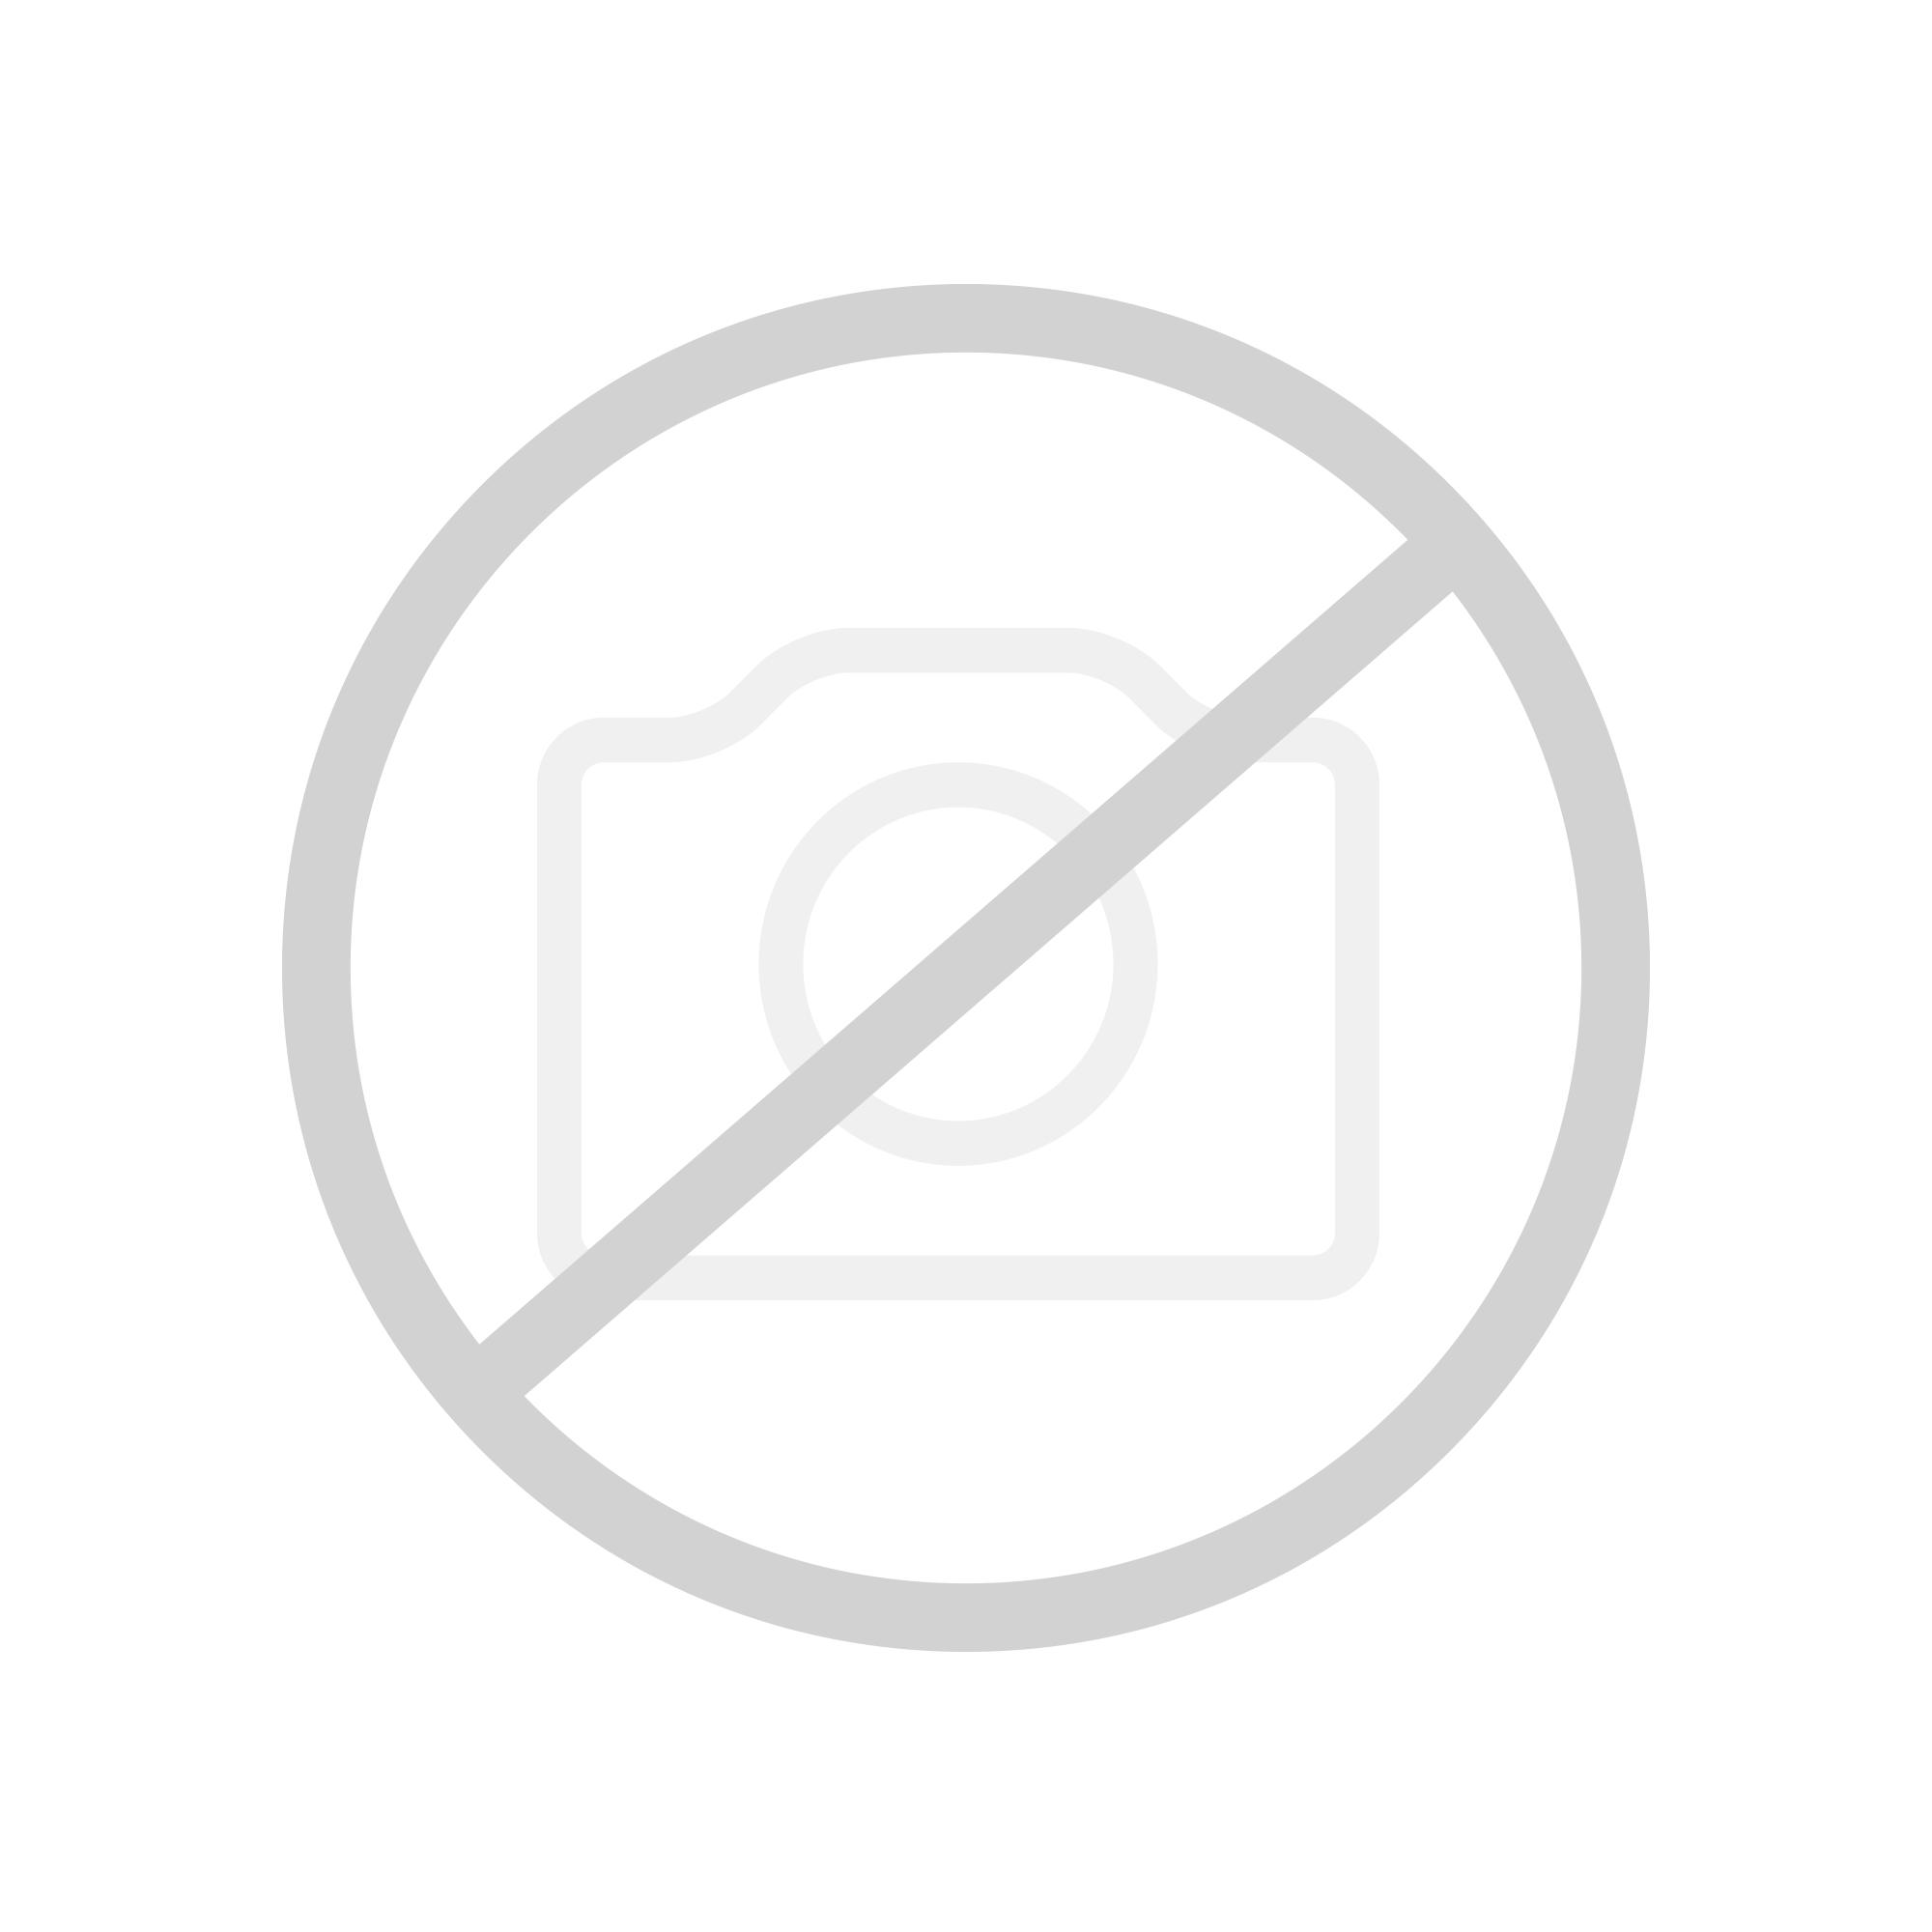 louis poulsen Toldbod 155/220 Pendelleuchte